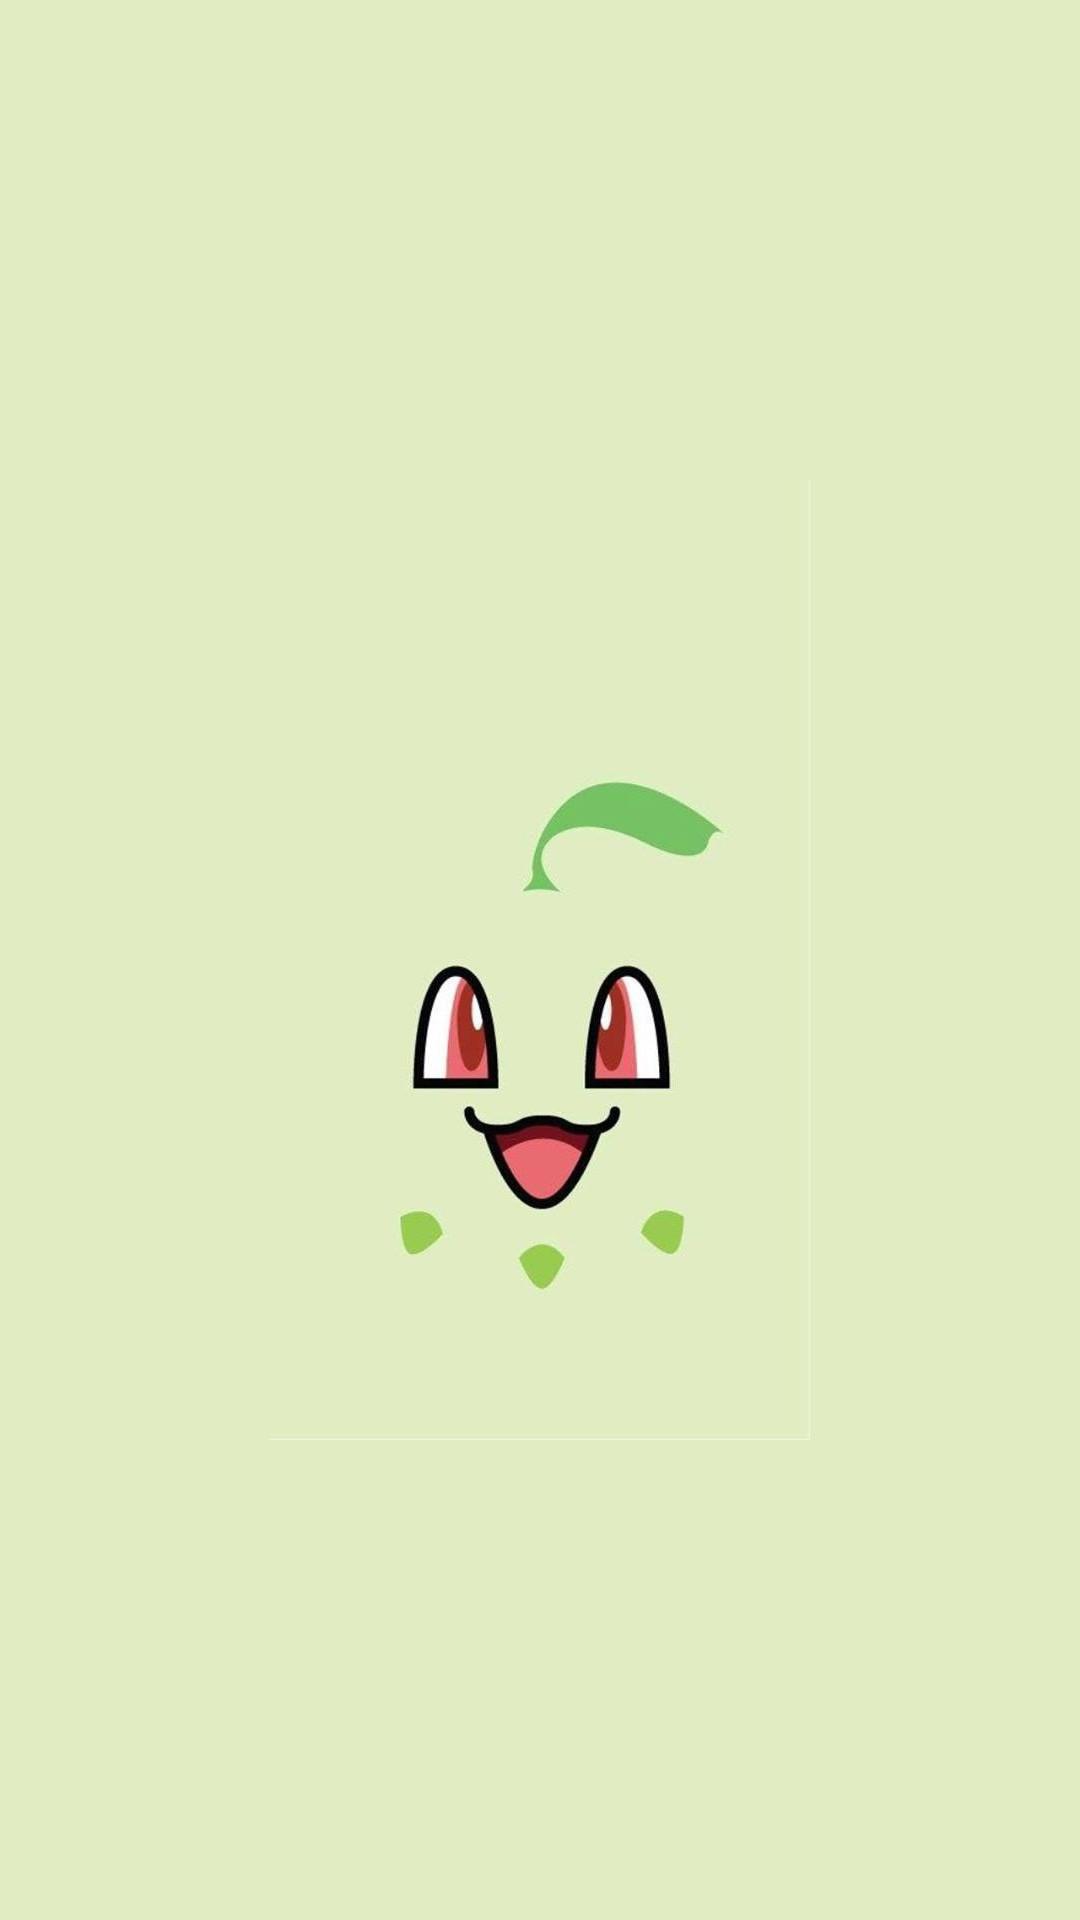 Chikorita Pokemon iPhone 6+ HD Wallpaper – https://freebestpicture.com/